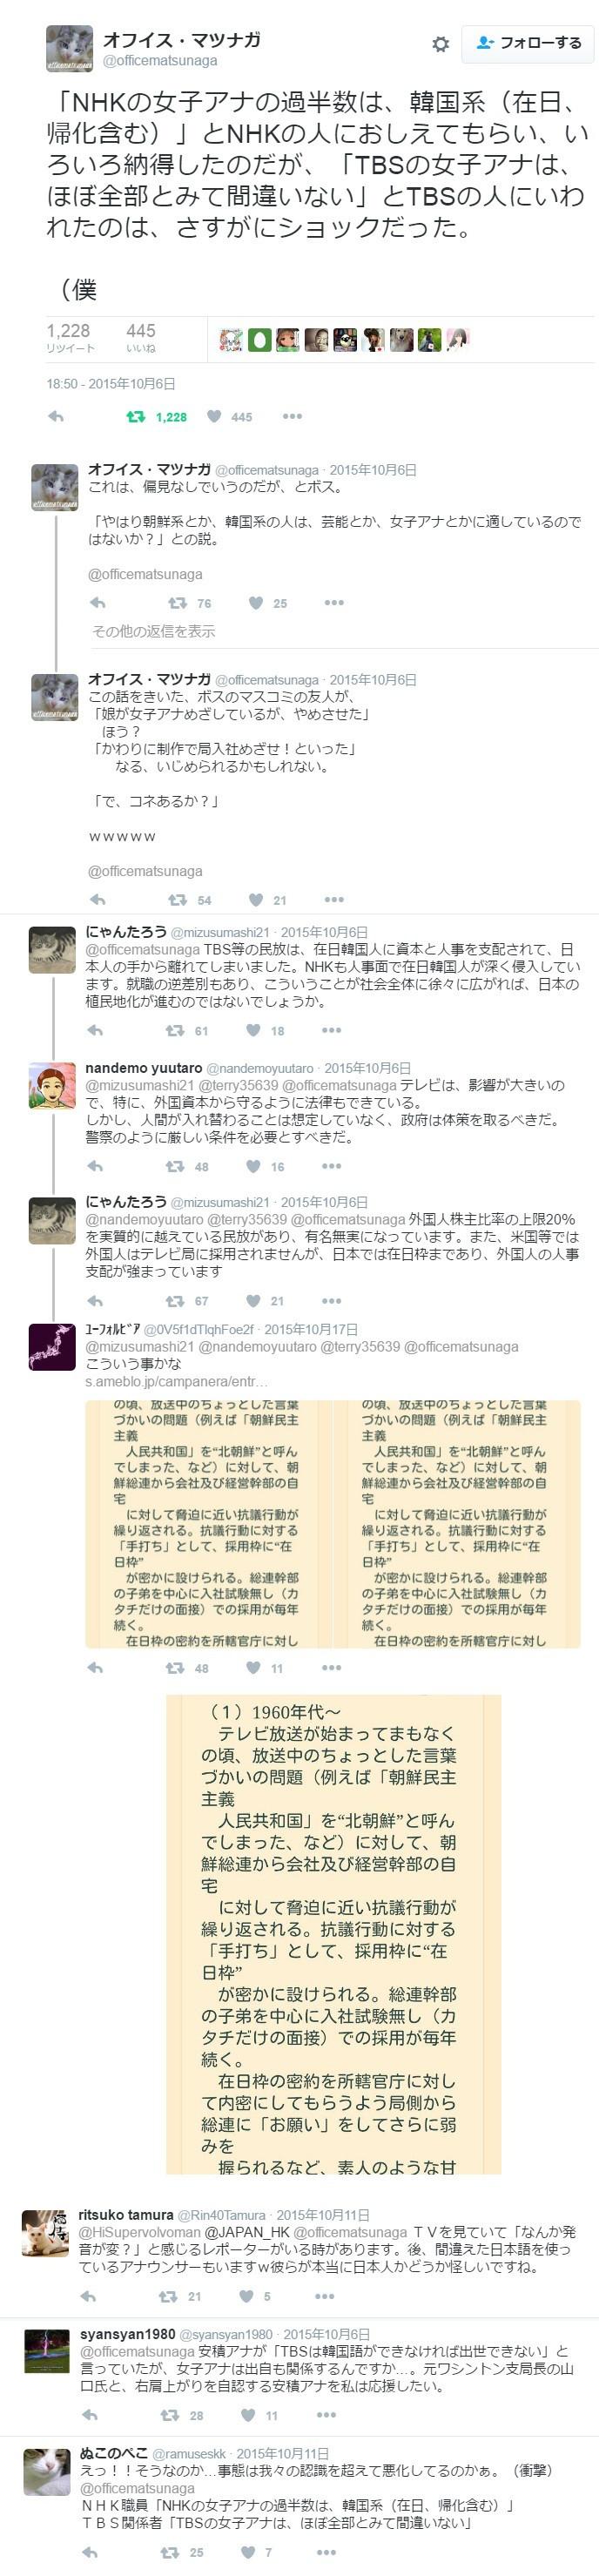 NHK女子アナの過半数は在日朝鮮人